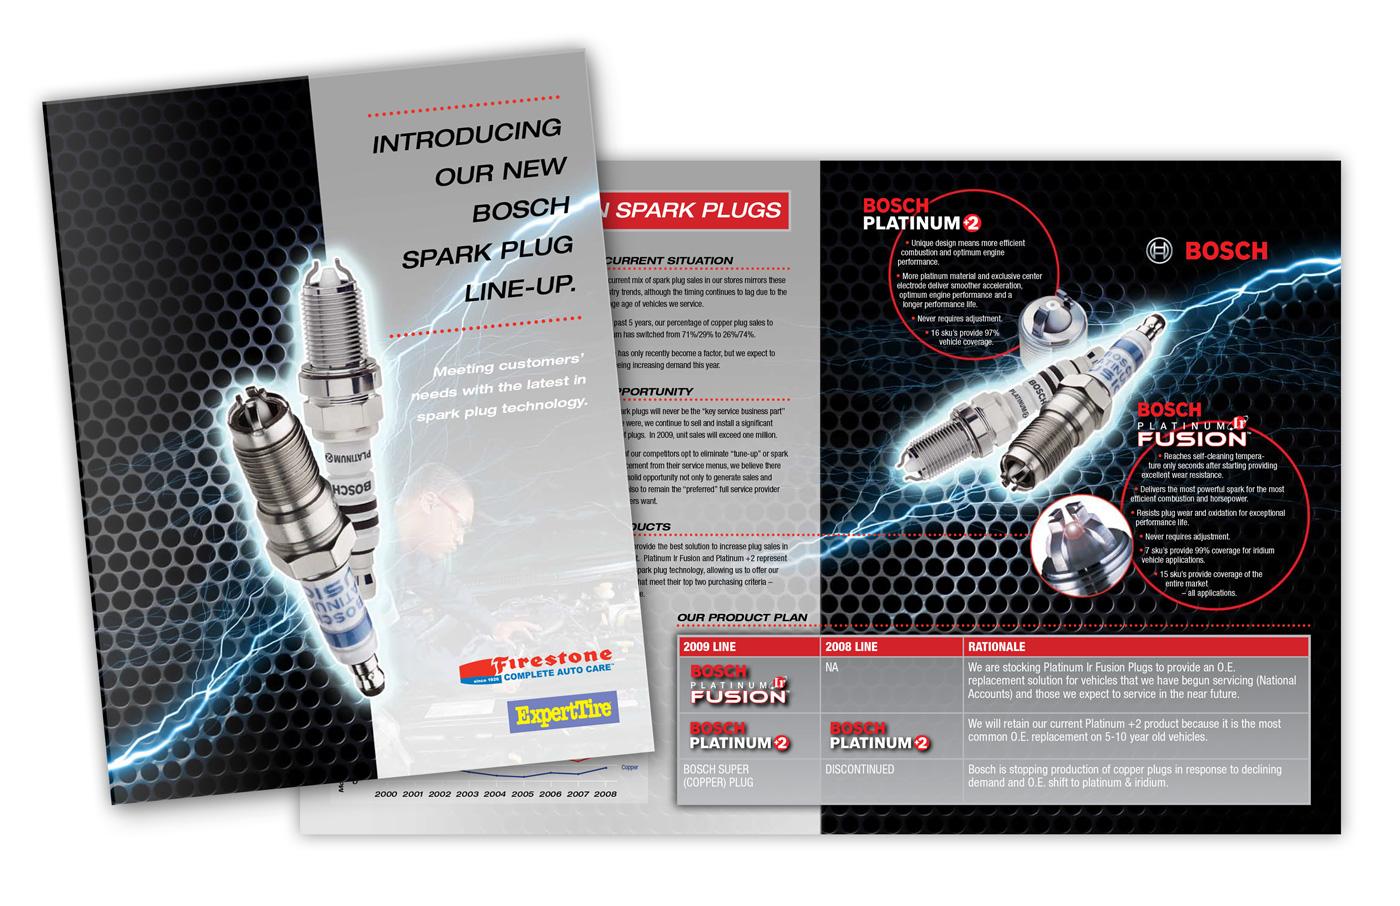 Bosch_fcac_ET_spark-plug-brochure